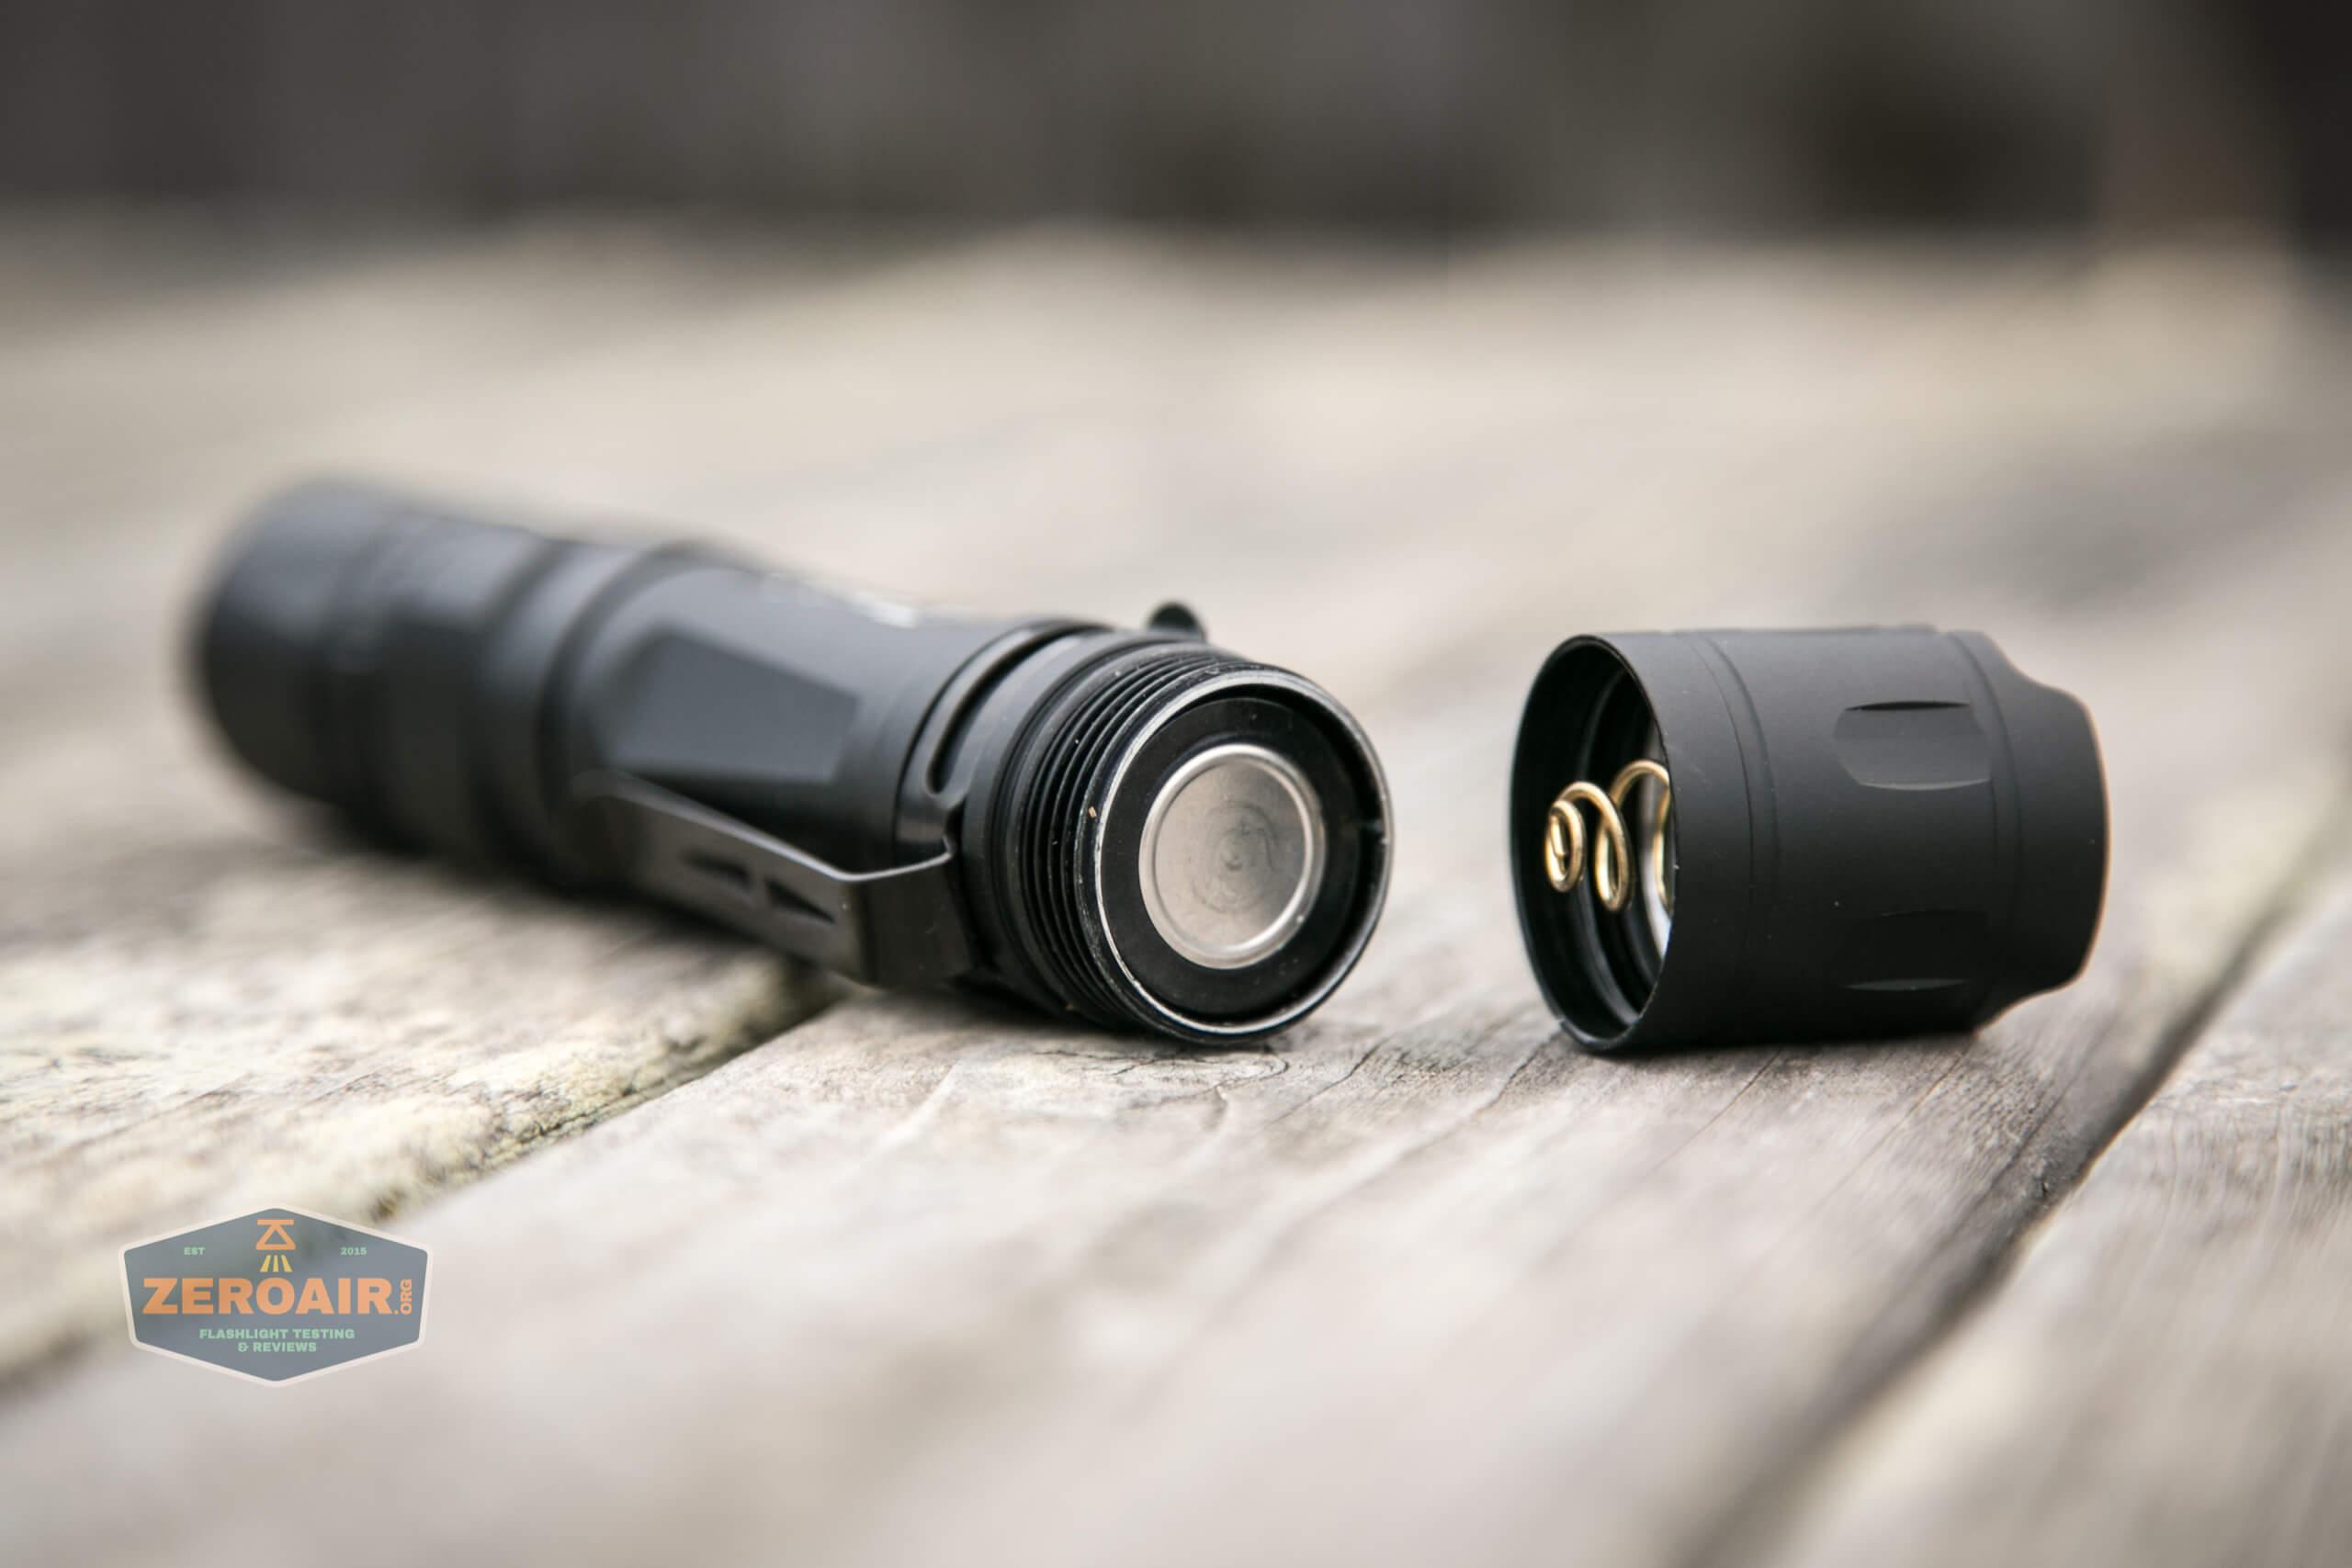 Cyansky P25 Flashlight cell installed